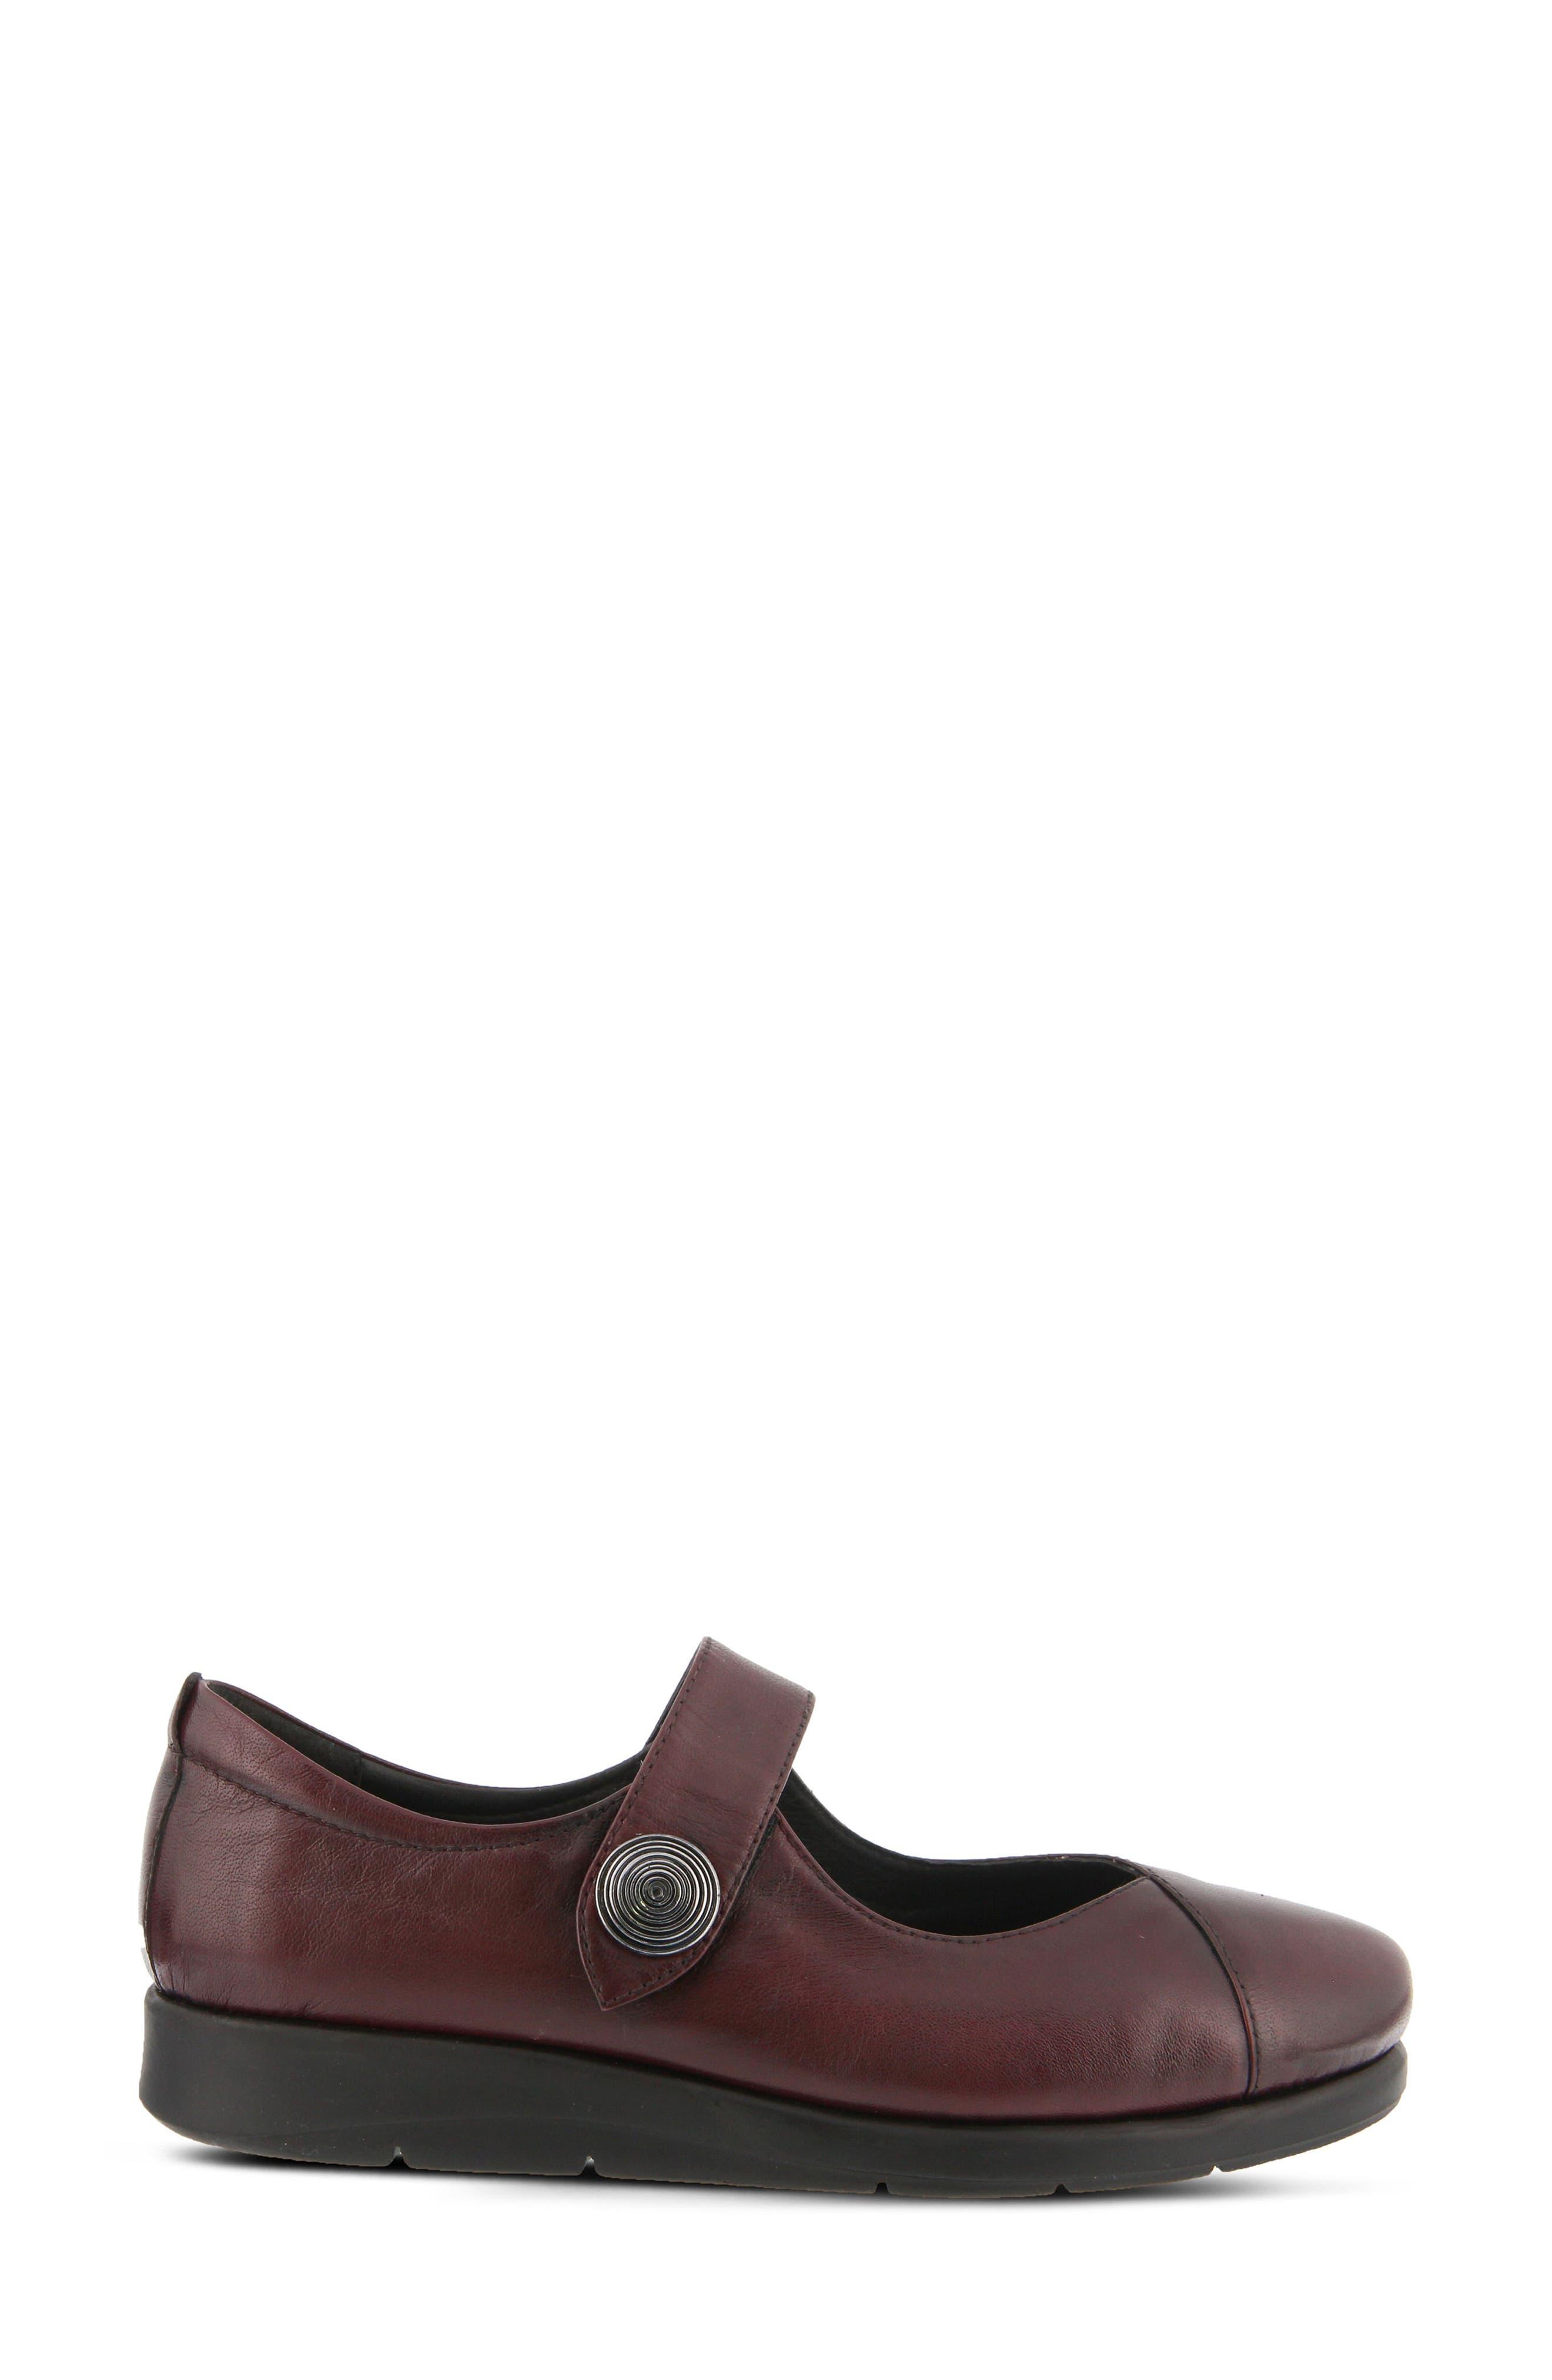 Zemira Flat,                             Alternate thumbnail 2, color,                             Bordeaux Leather